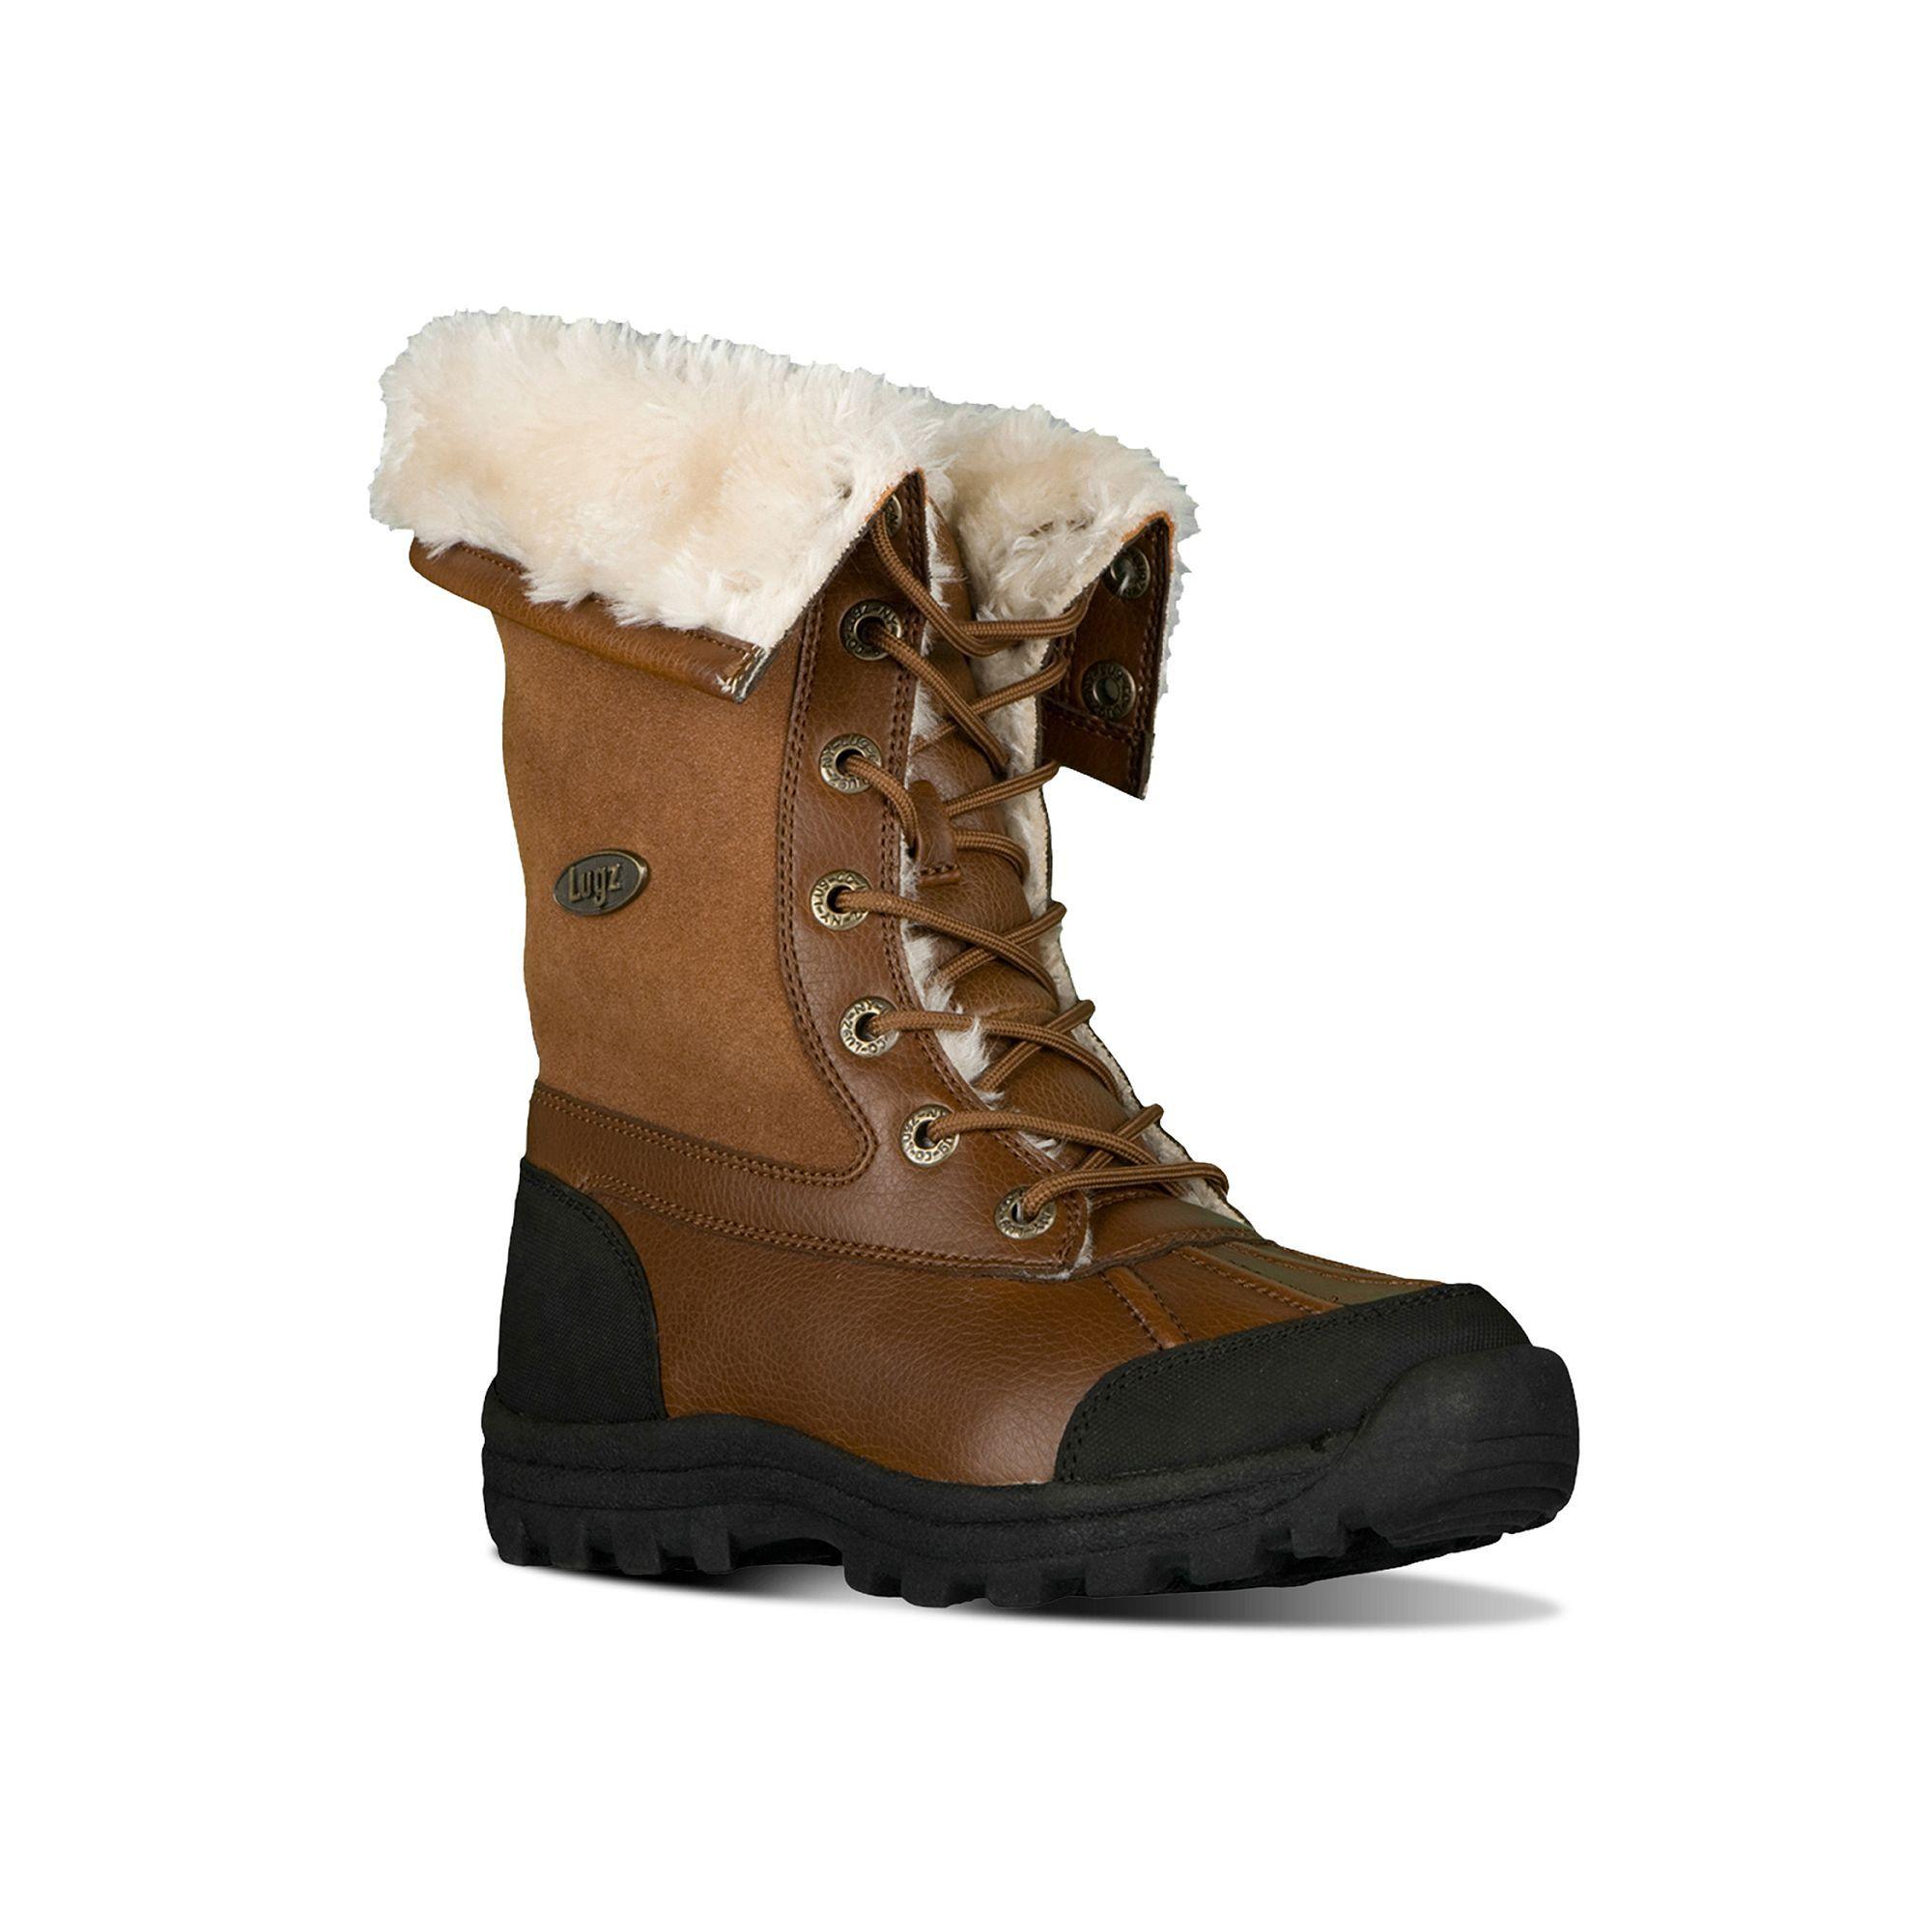 a61c8e2b547 Lugz Tambora Women's Winter Boots | Products | Snow boots women ...